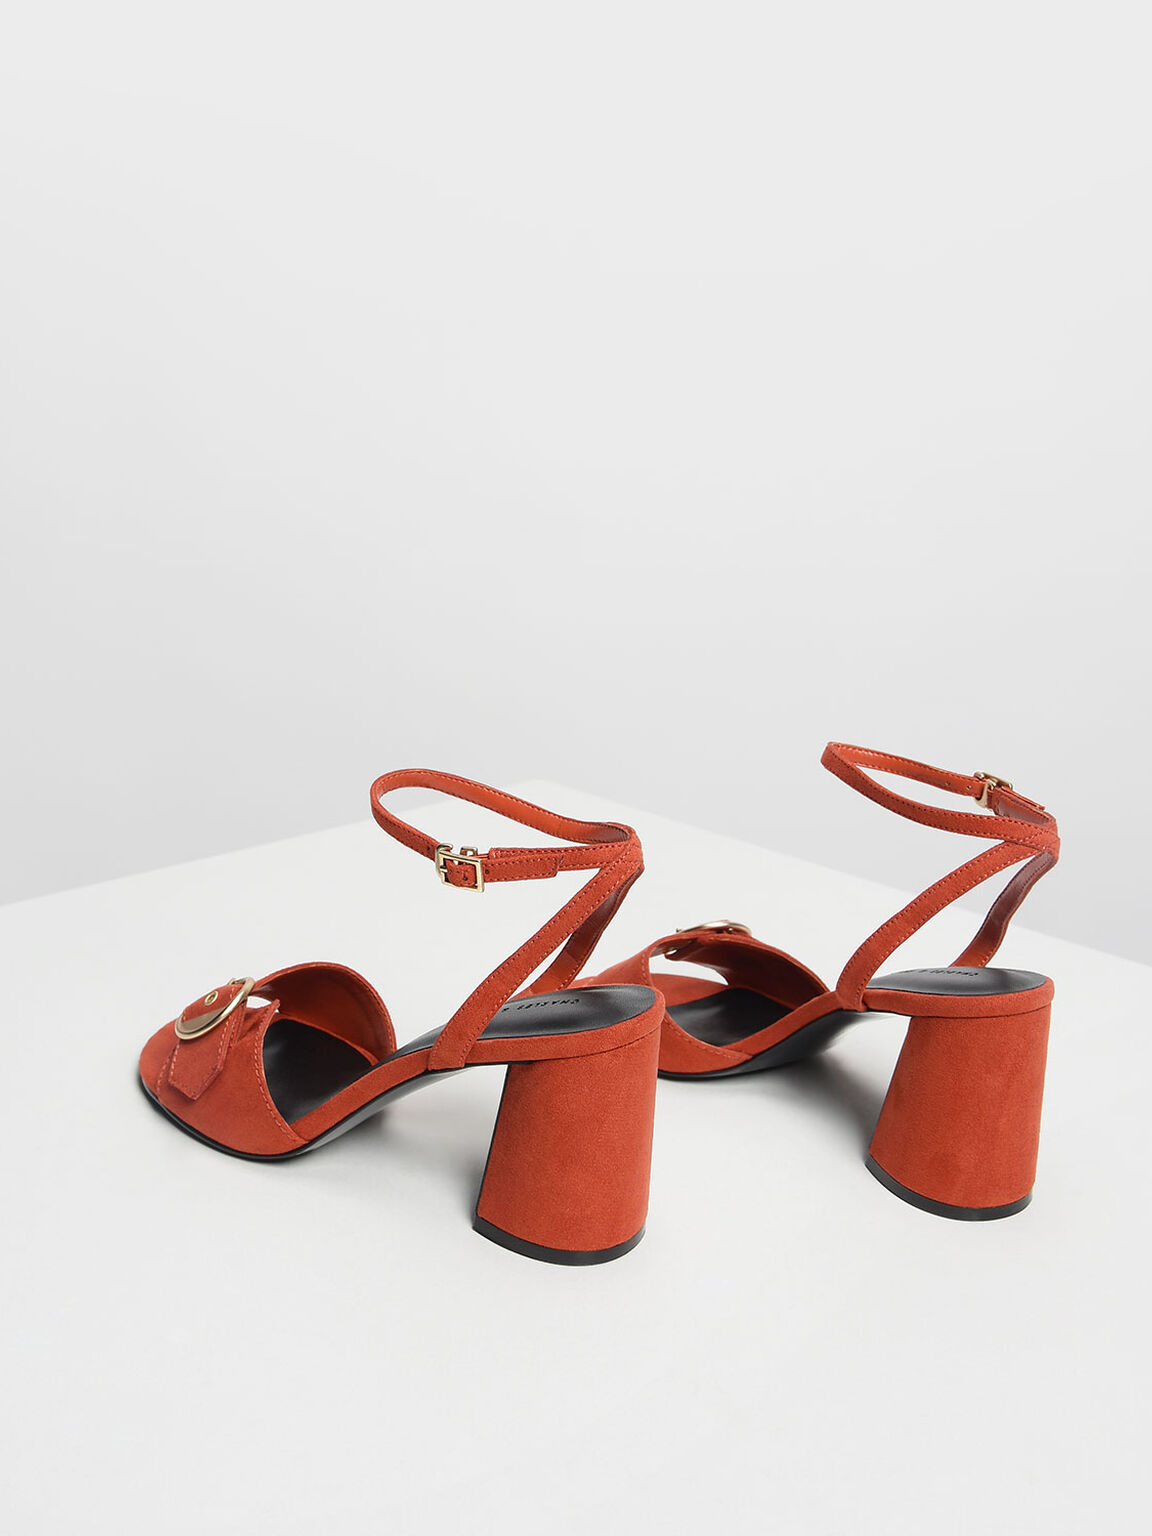 圓扣粗跟涼鞋, 橘色, hi-res